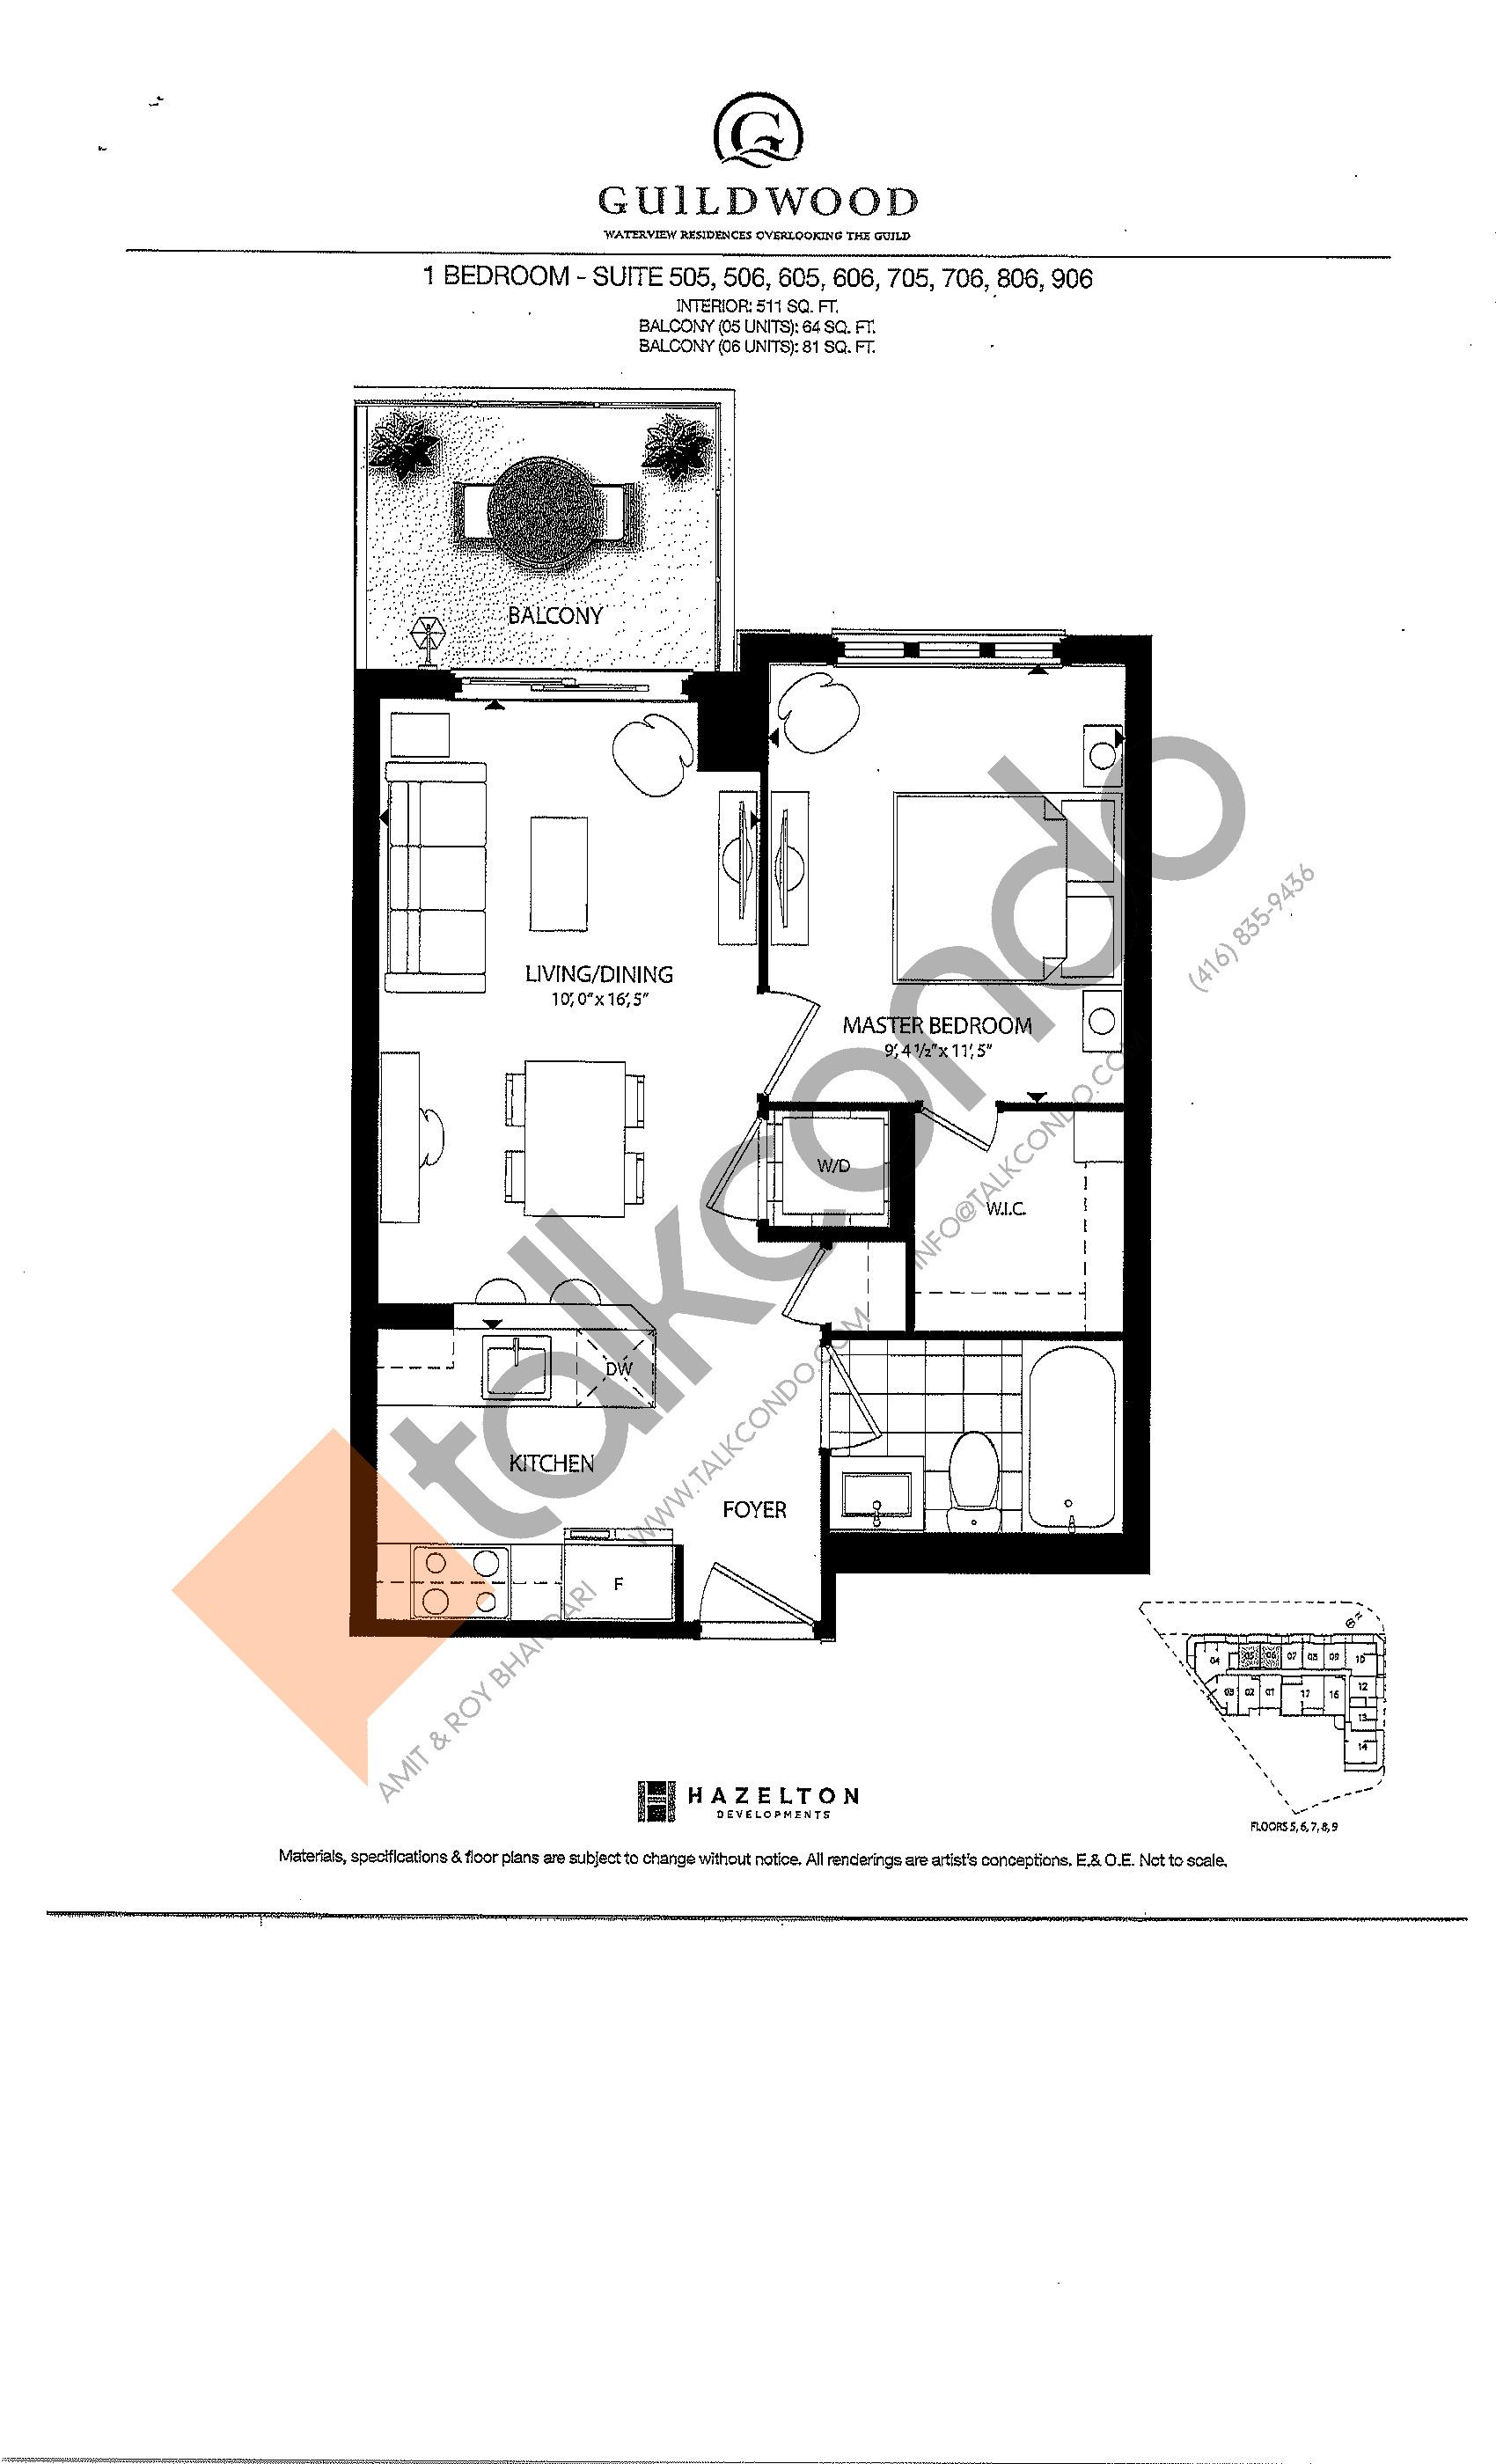 Suites 505, 506, 605, 606, 705, 706, 806, 906 Floor Plan at Guildwood Condos - 511 sq.ft